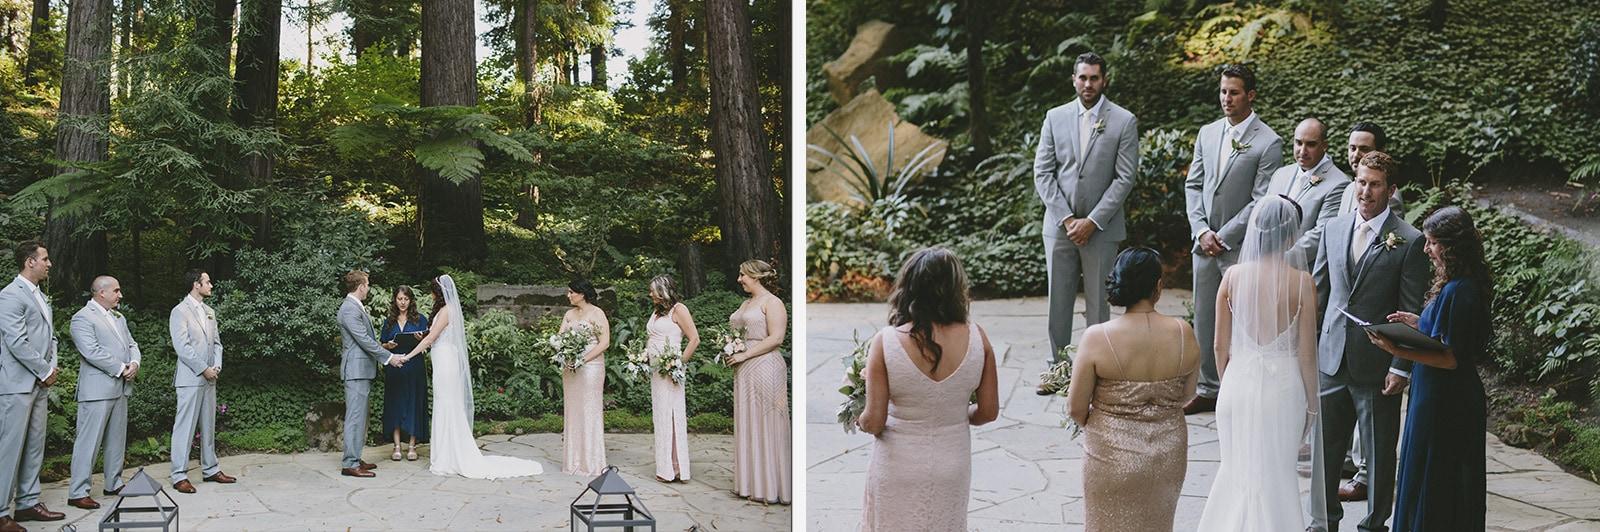 nestldown_wedding_018